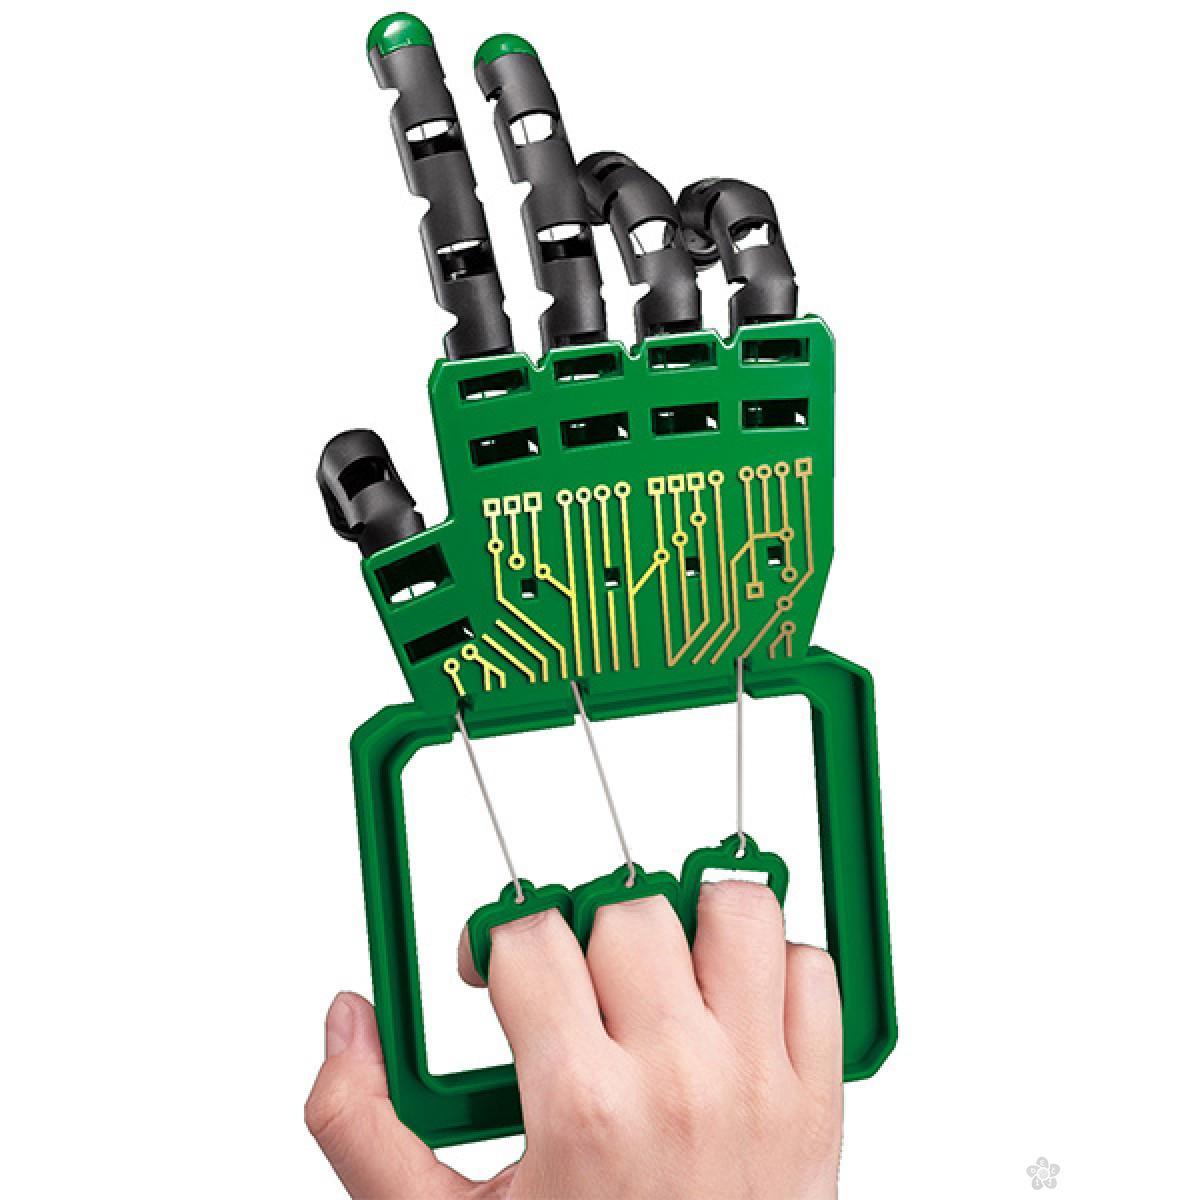 4M maketa Robotic Hand, 03284